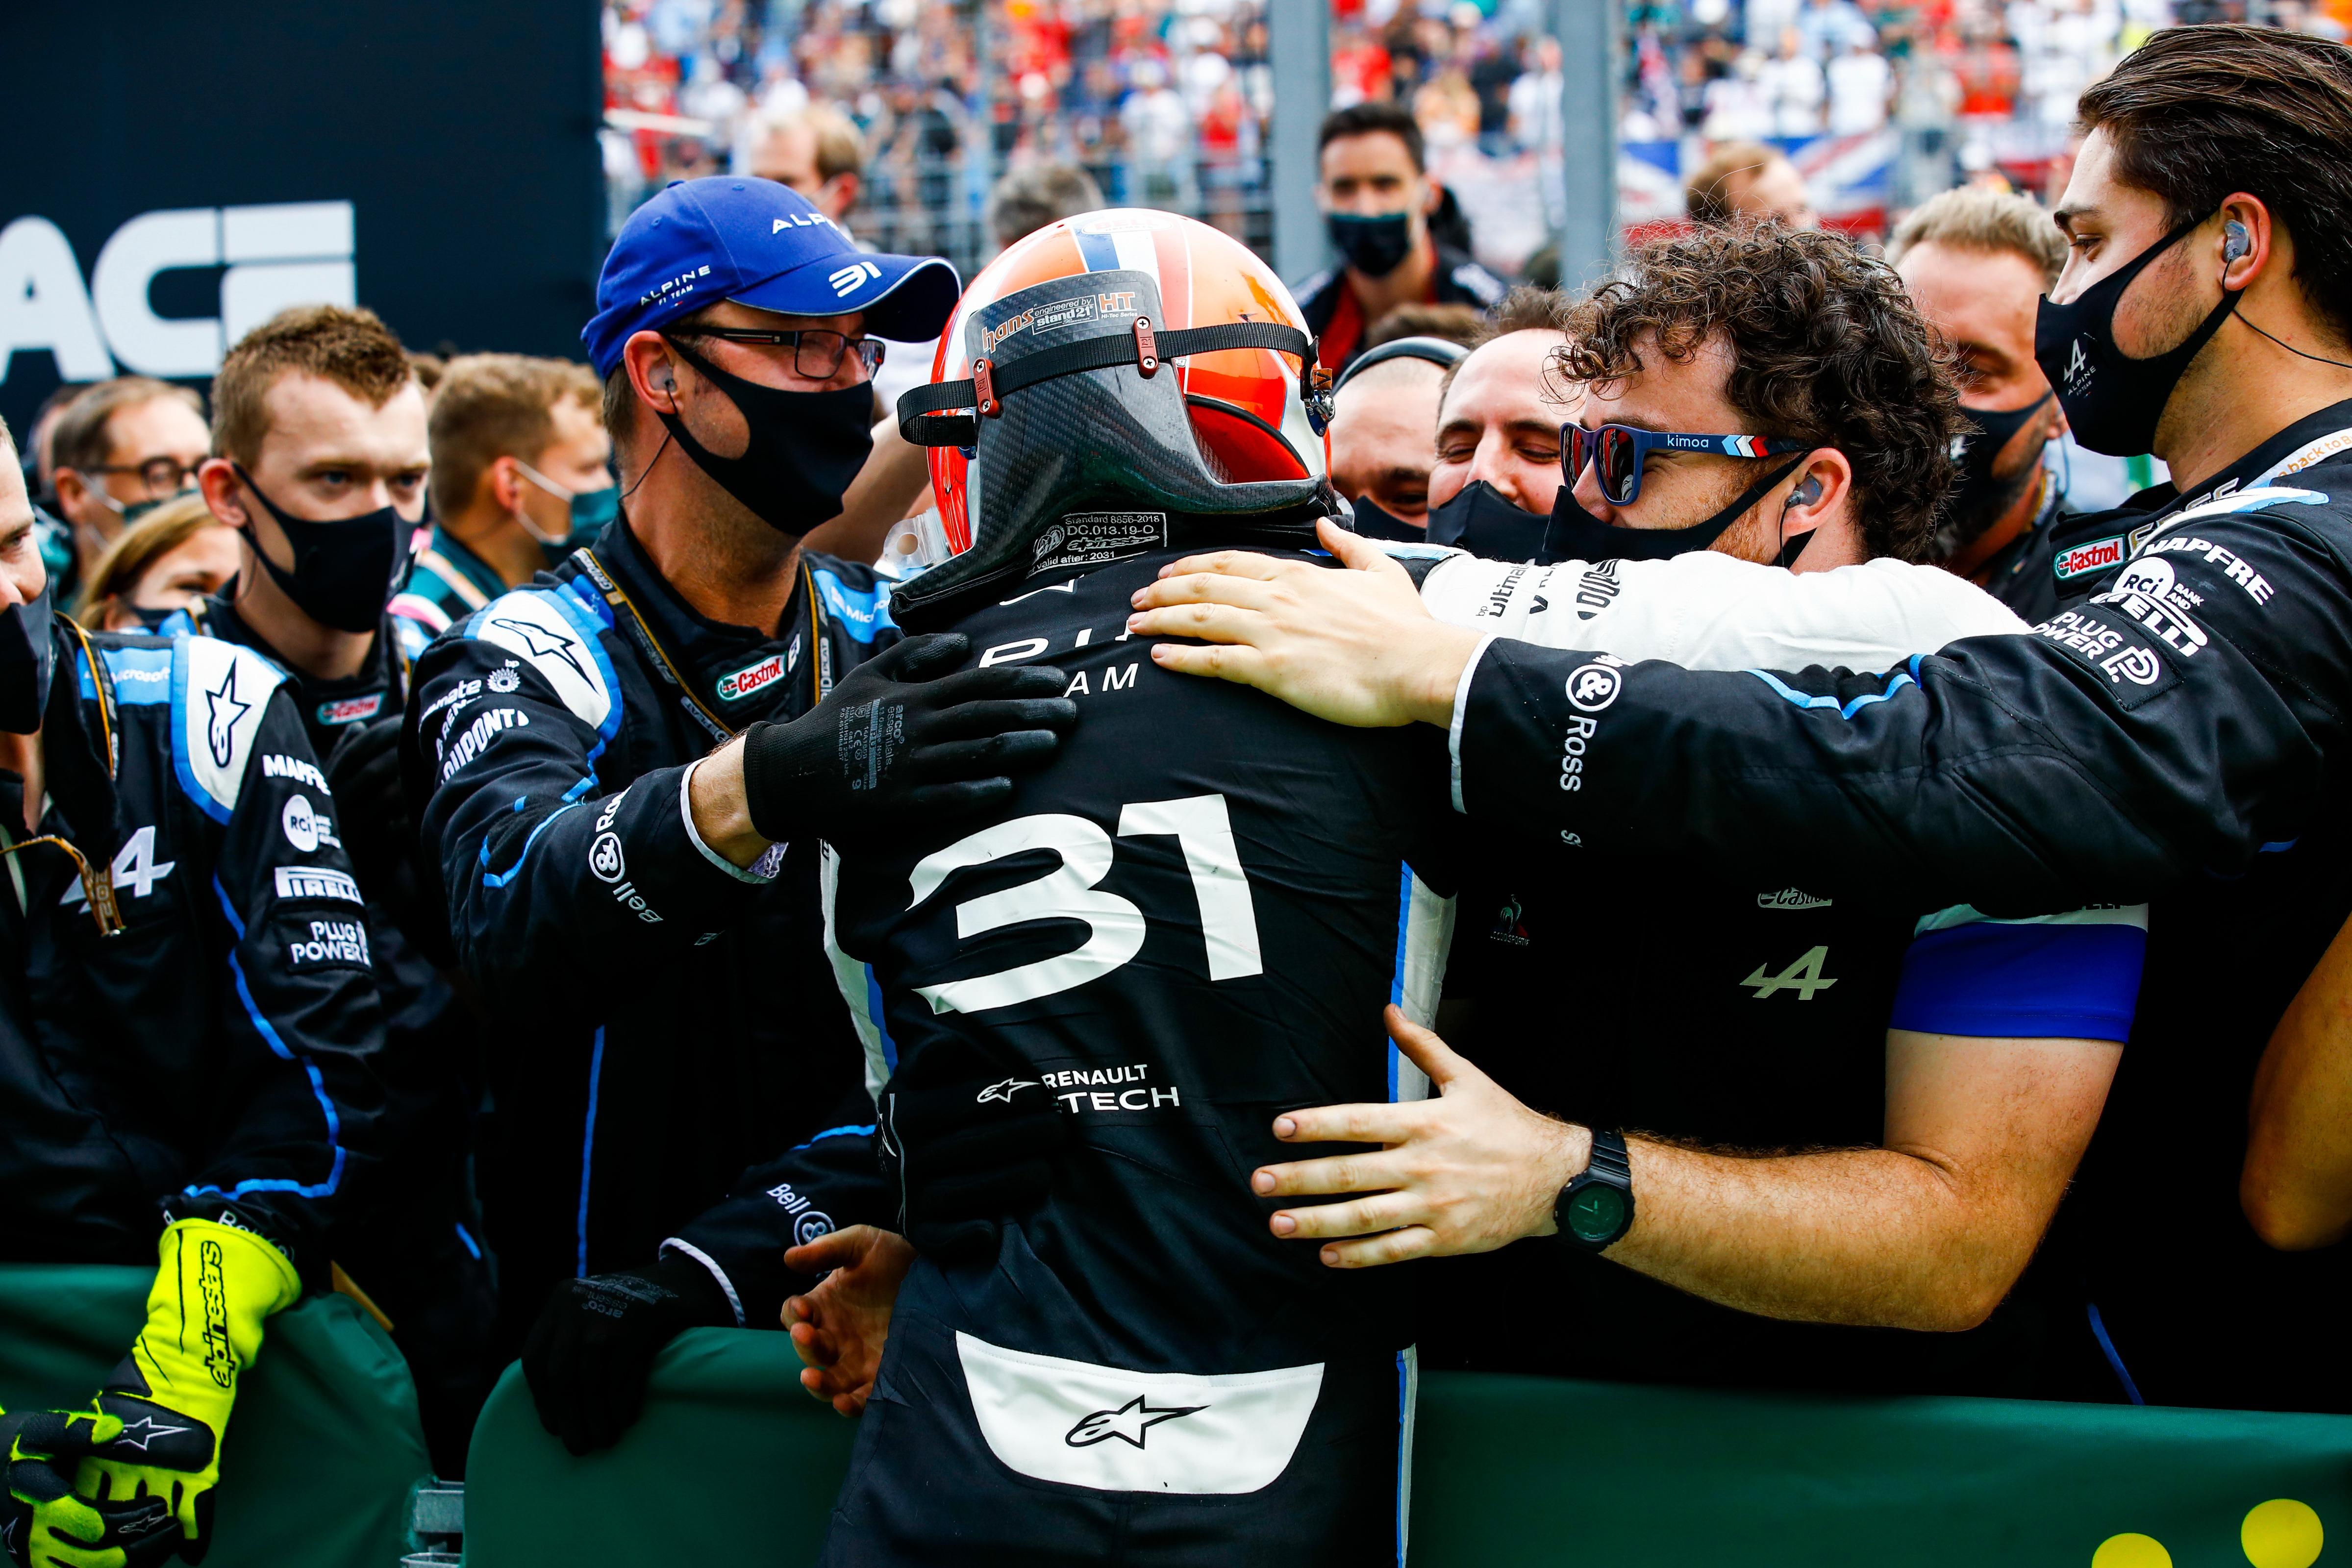 Esteban Ocon, Alpine F1, celebrates with his team in Parc Ferme